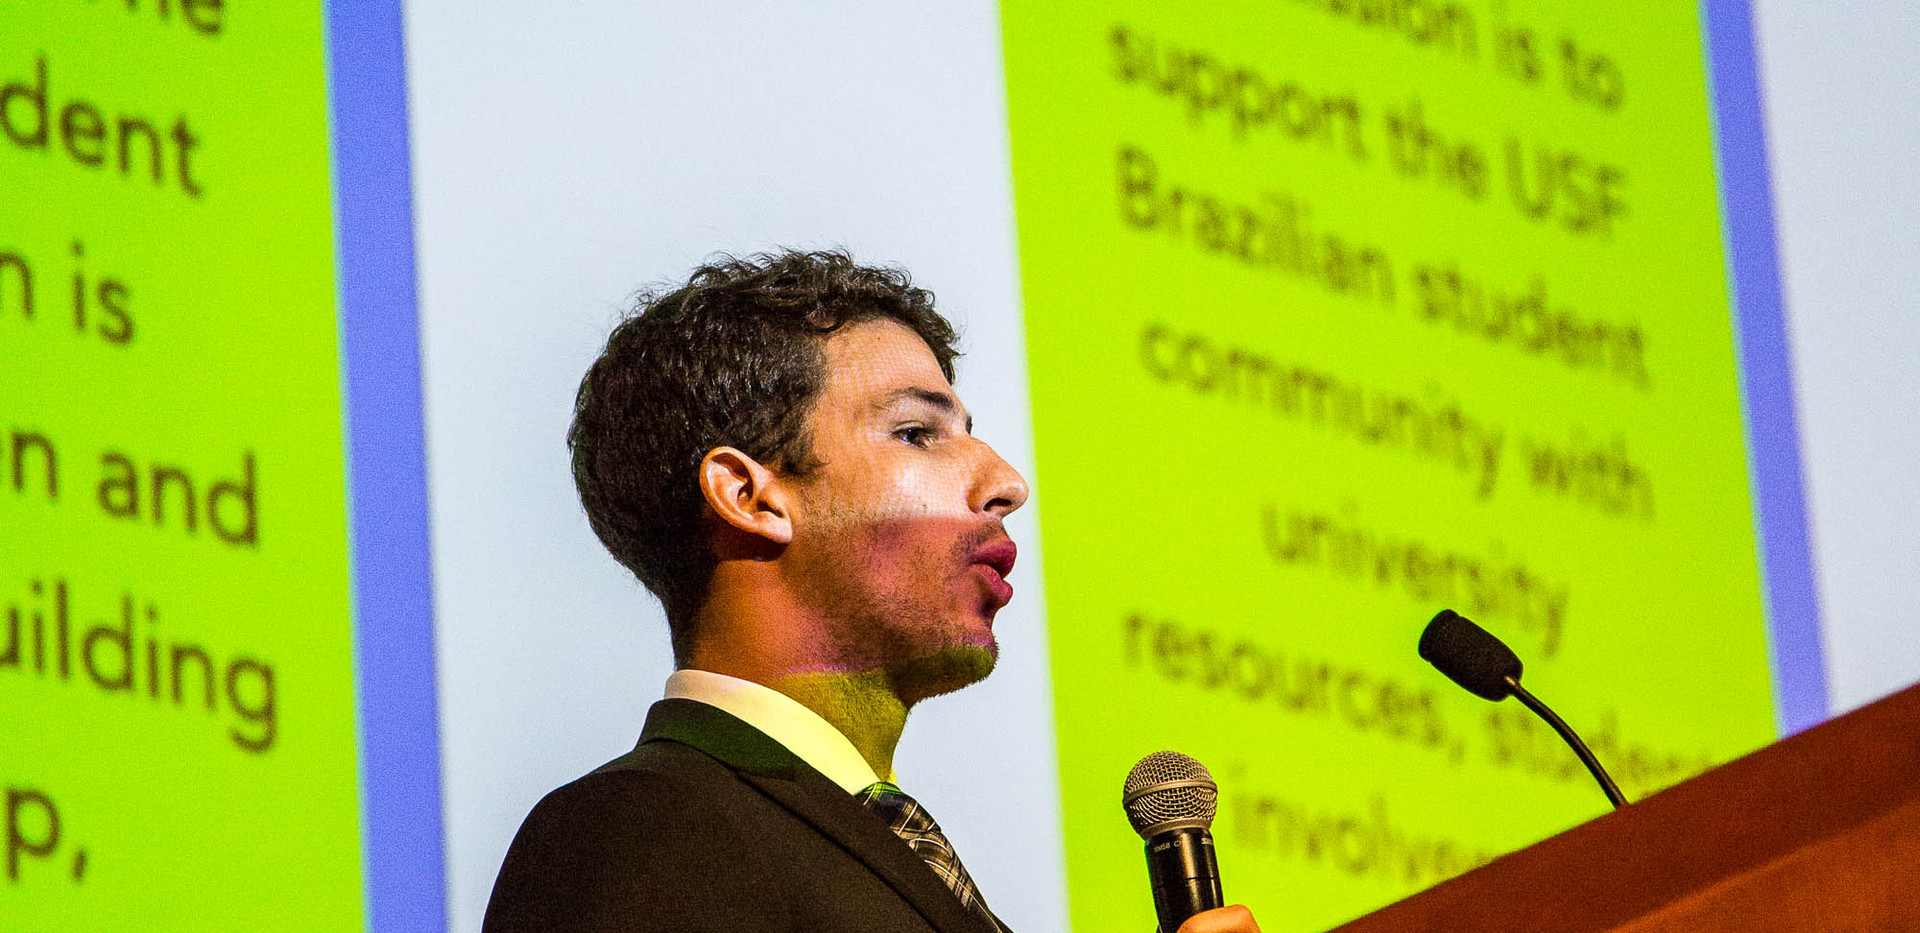 Brazil-FloridaStudentConference-17.jpg